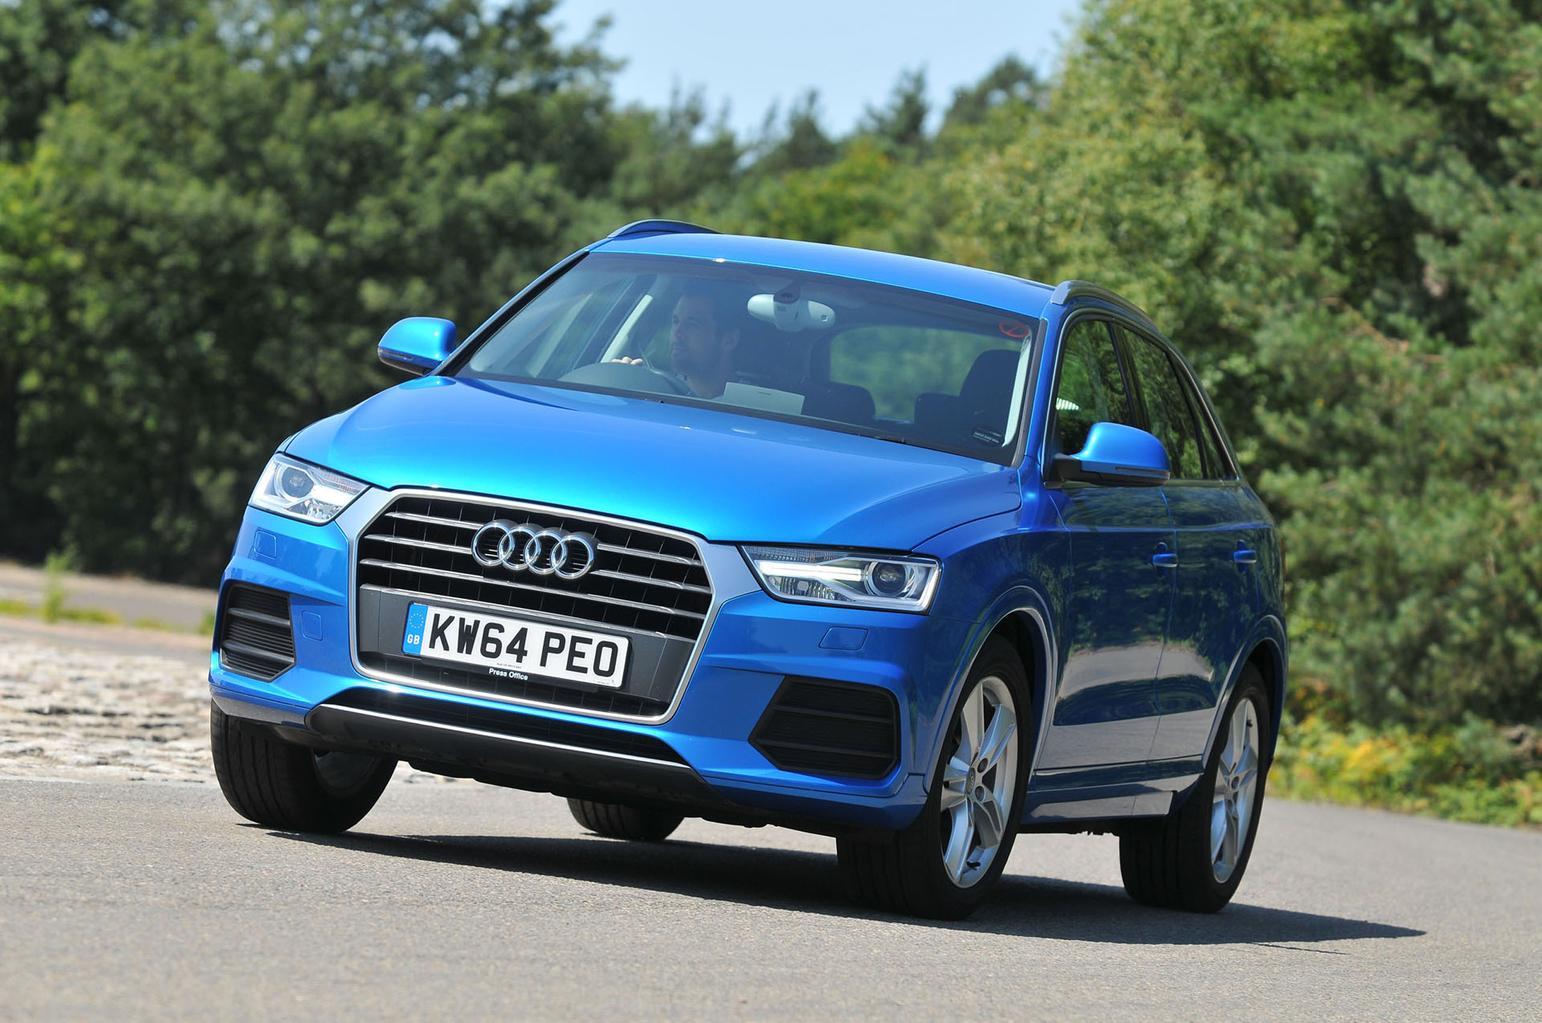 5 reasons to buy an Audi Q3